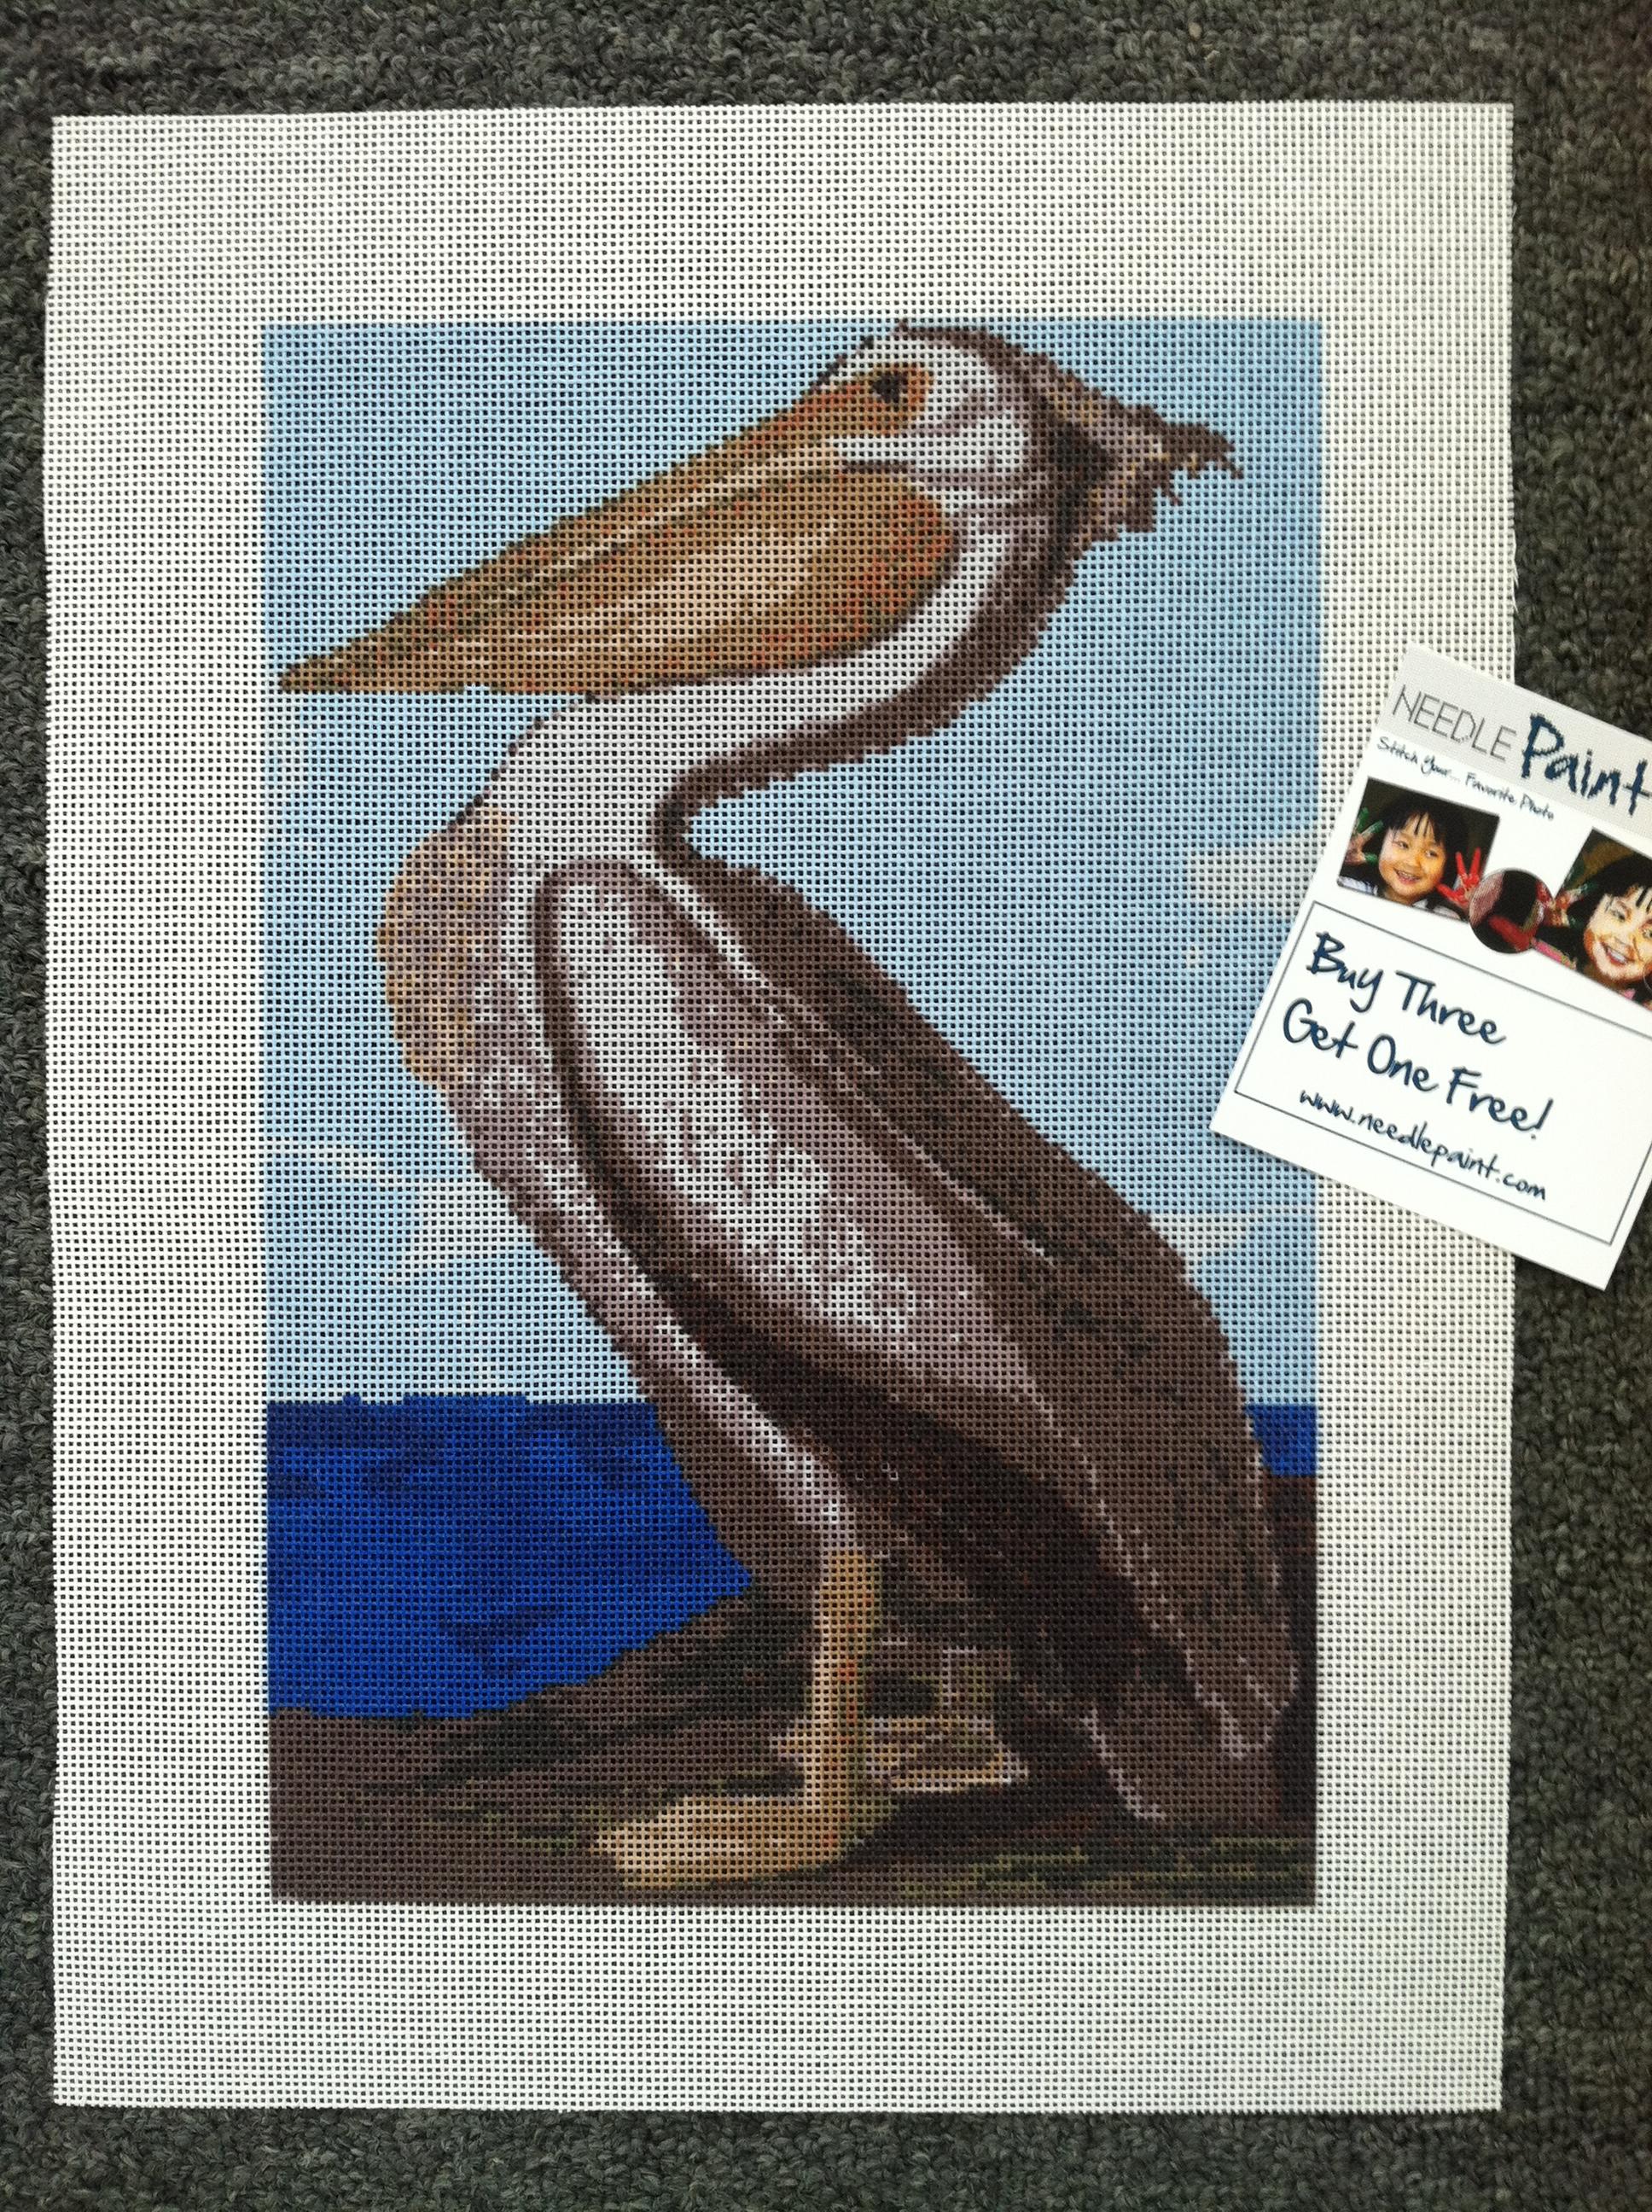 John James Audubon White Pelican Needlepoint Kit